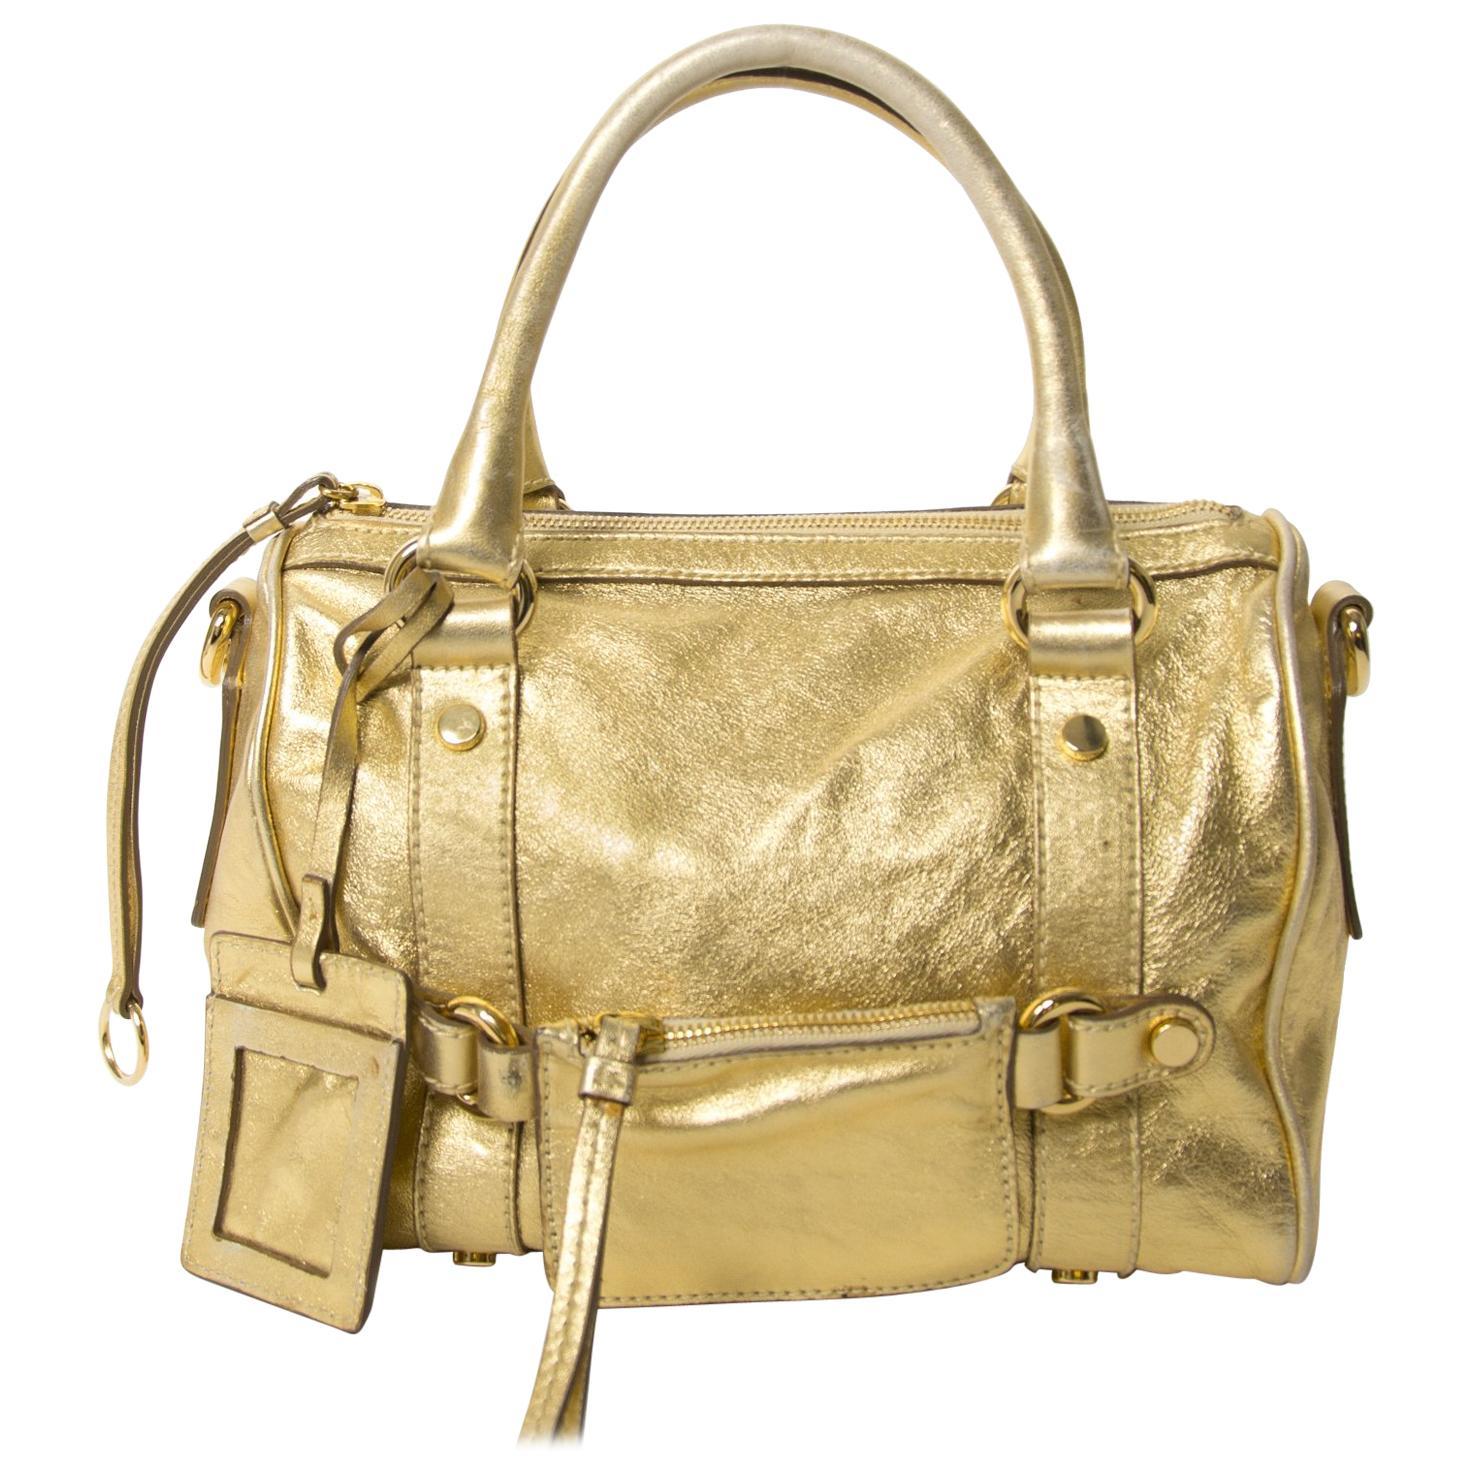 Dolce & Gabbana Gold Metallic Speedy Bag